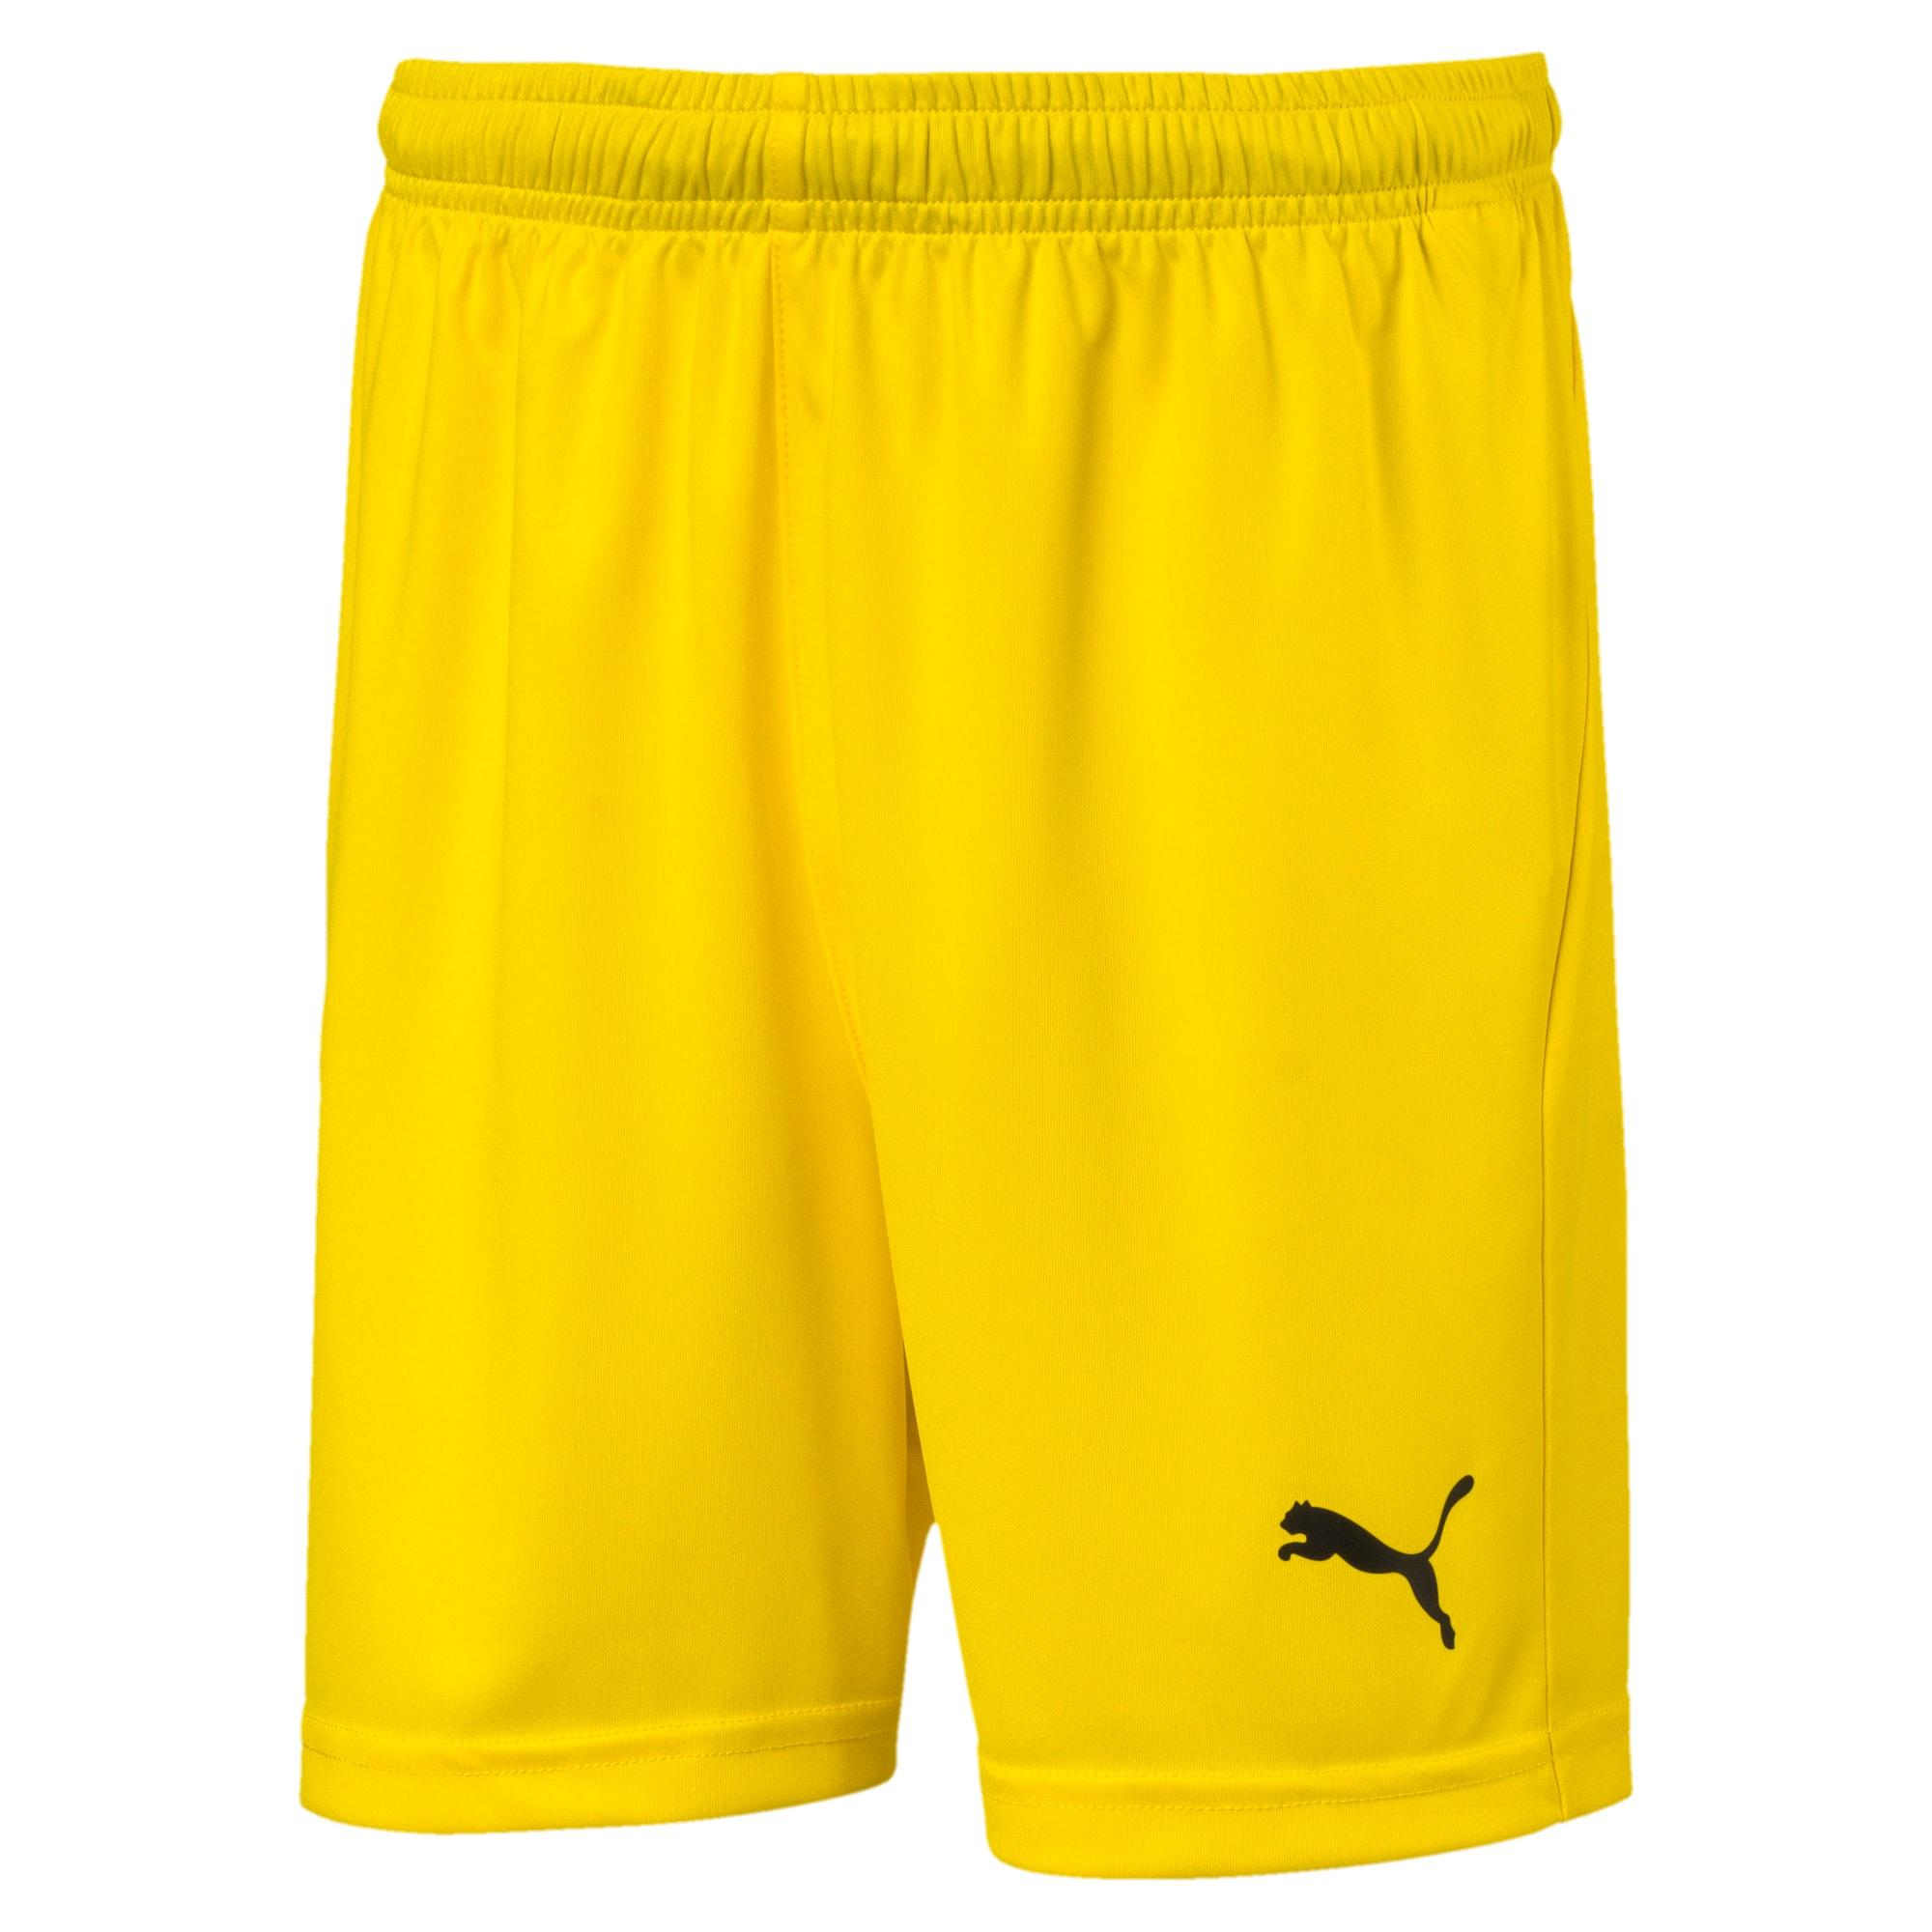 Thumbnail 1 of Liga Core Junior Football Shorts, Cyber Yellow-Puma Black, medium